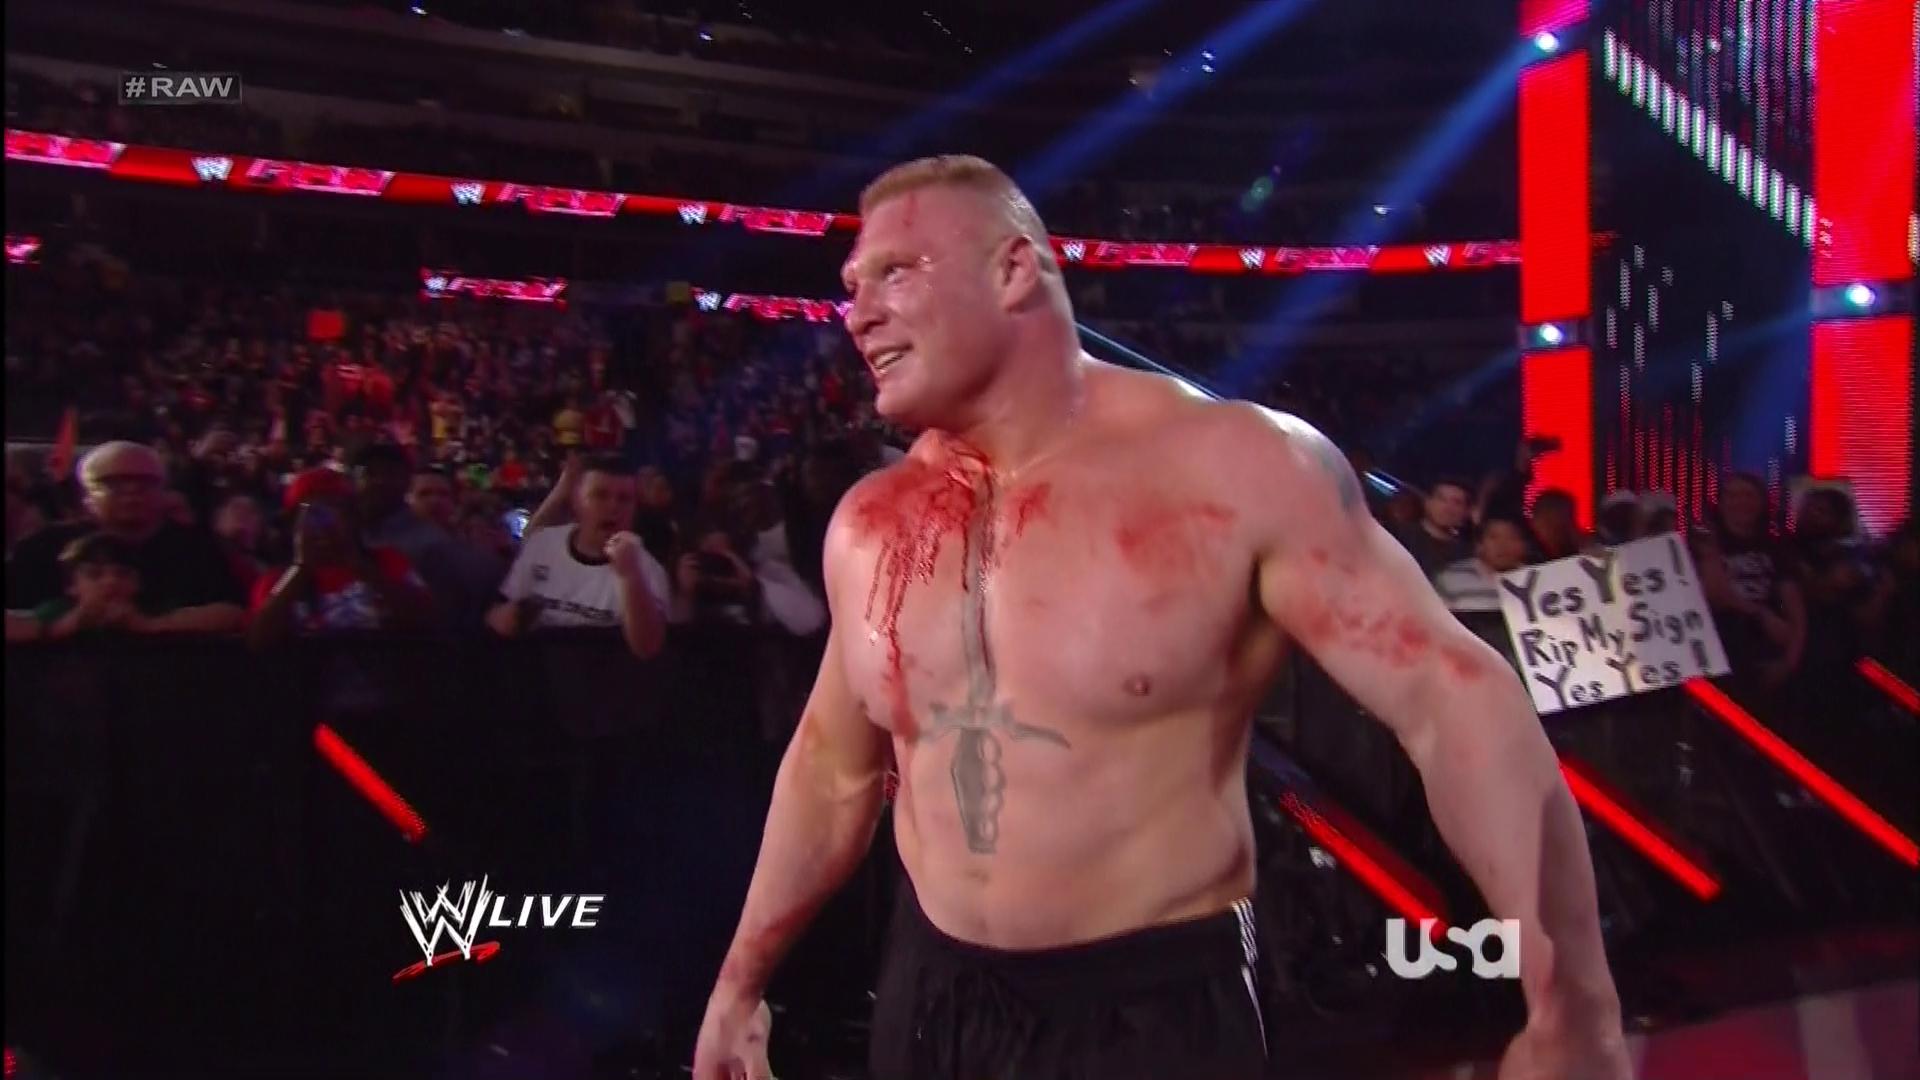 Pro Wrestling Flashback Brock Lesnar Shows Up For The First Time